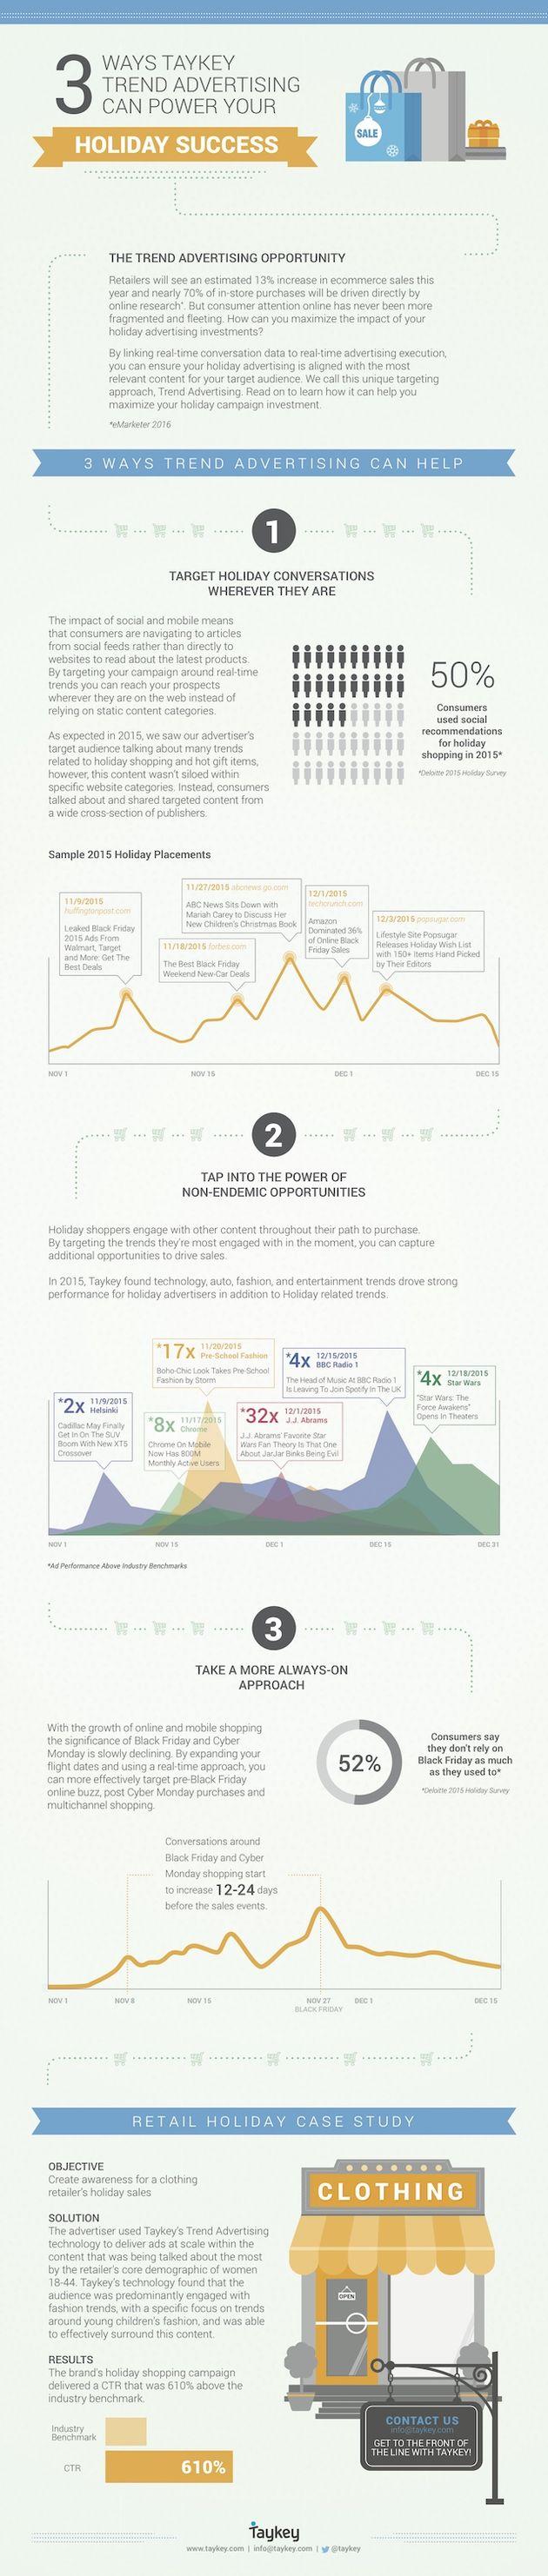 Taykey-Infographic